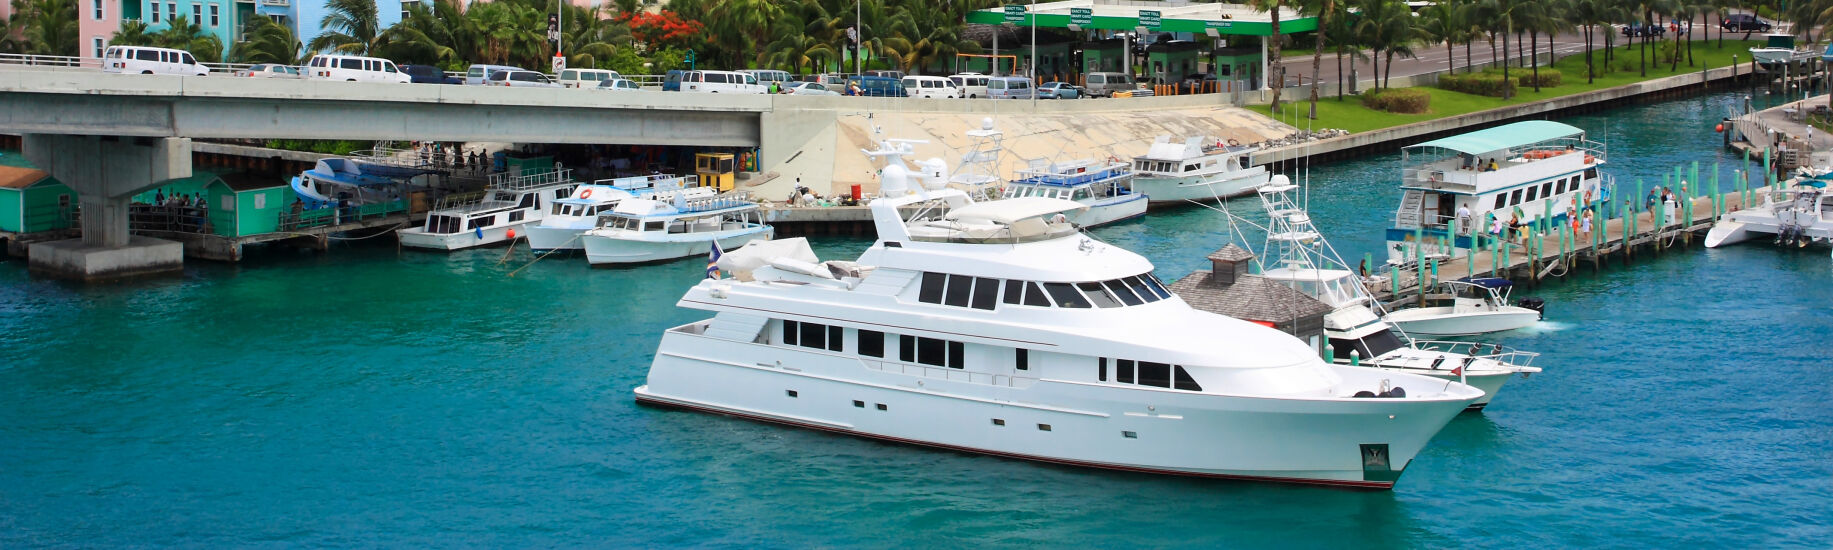 The Bahamas Yacht